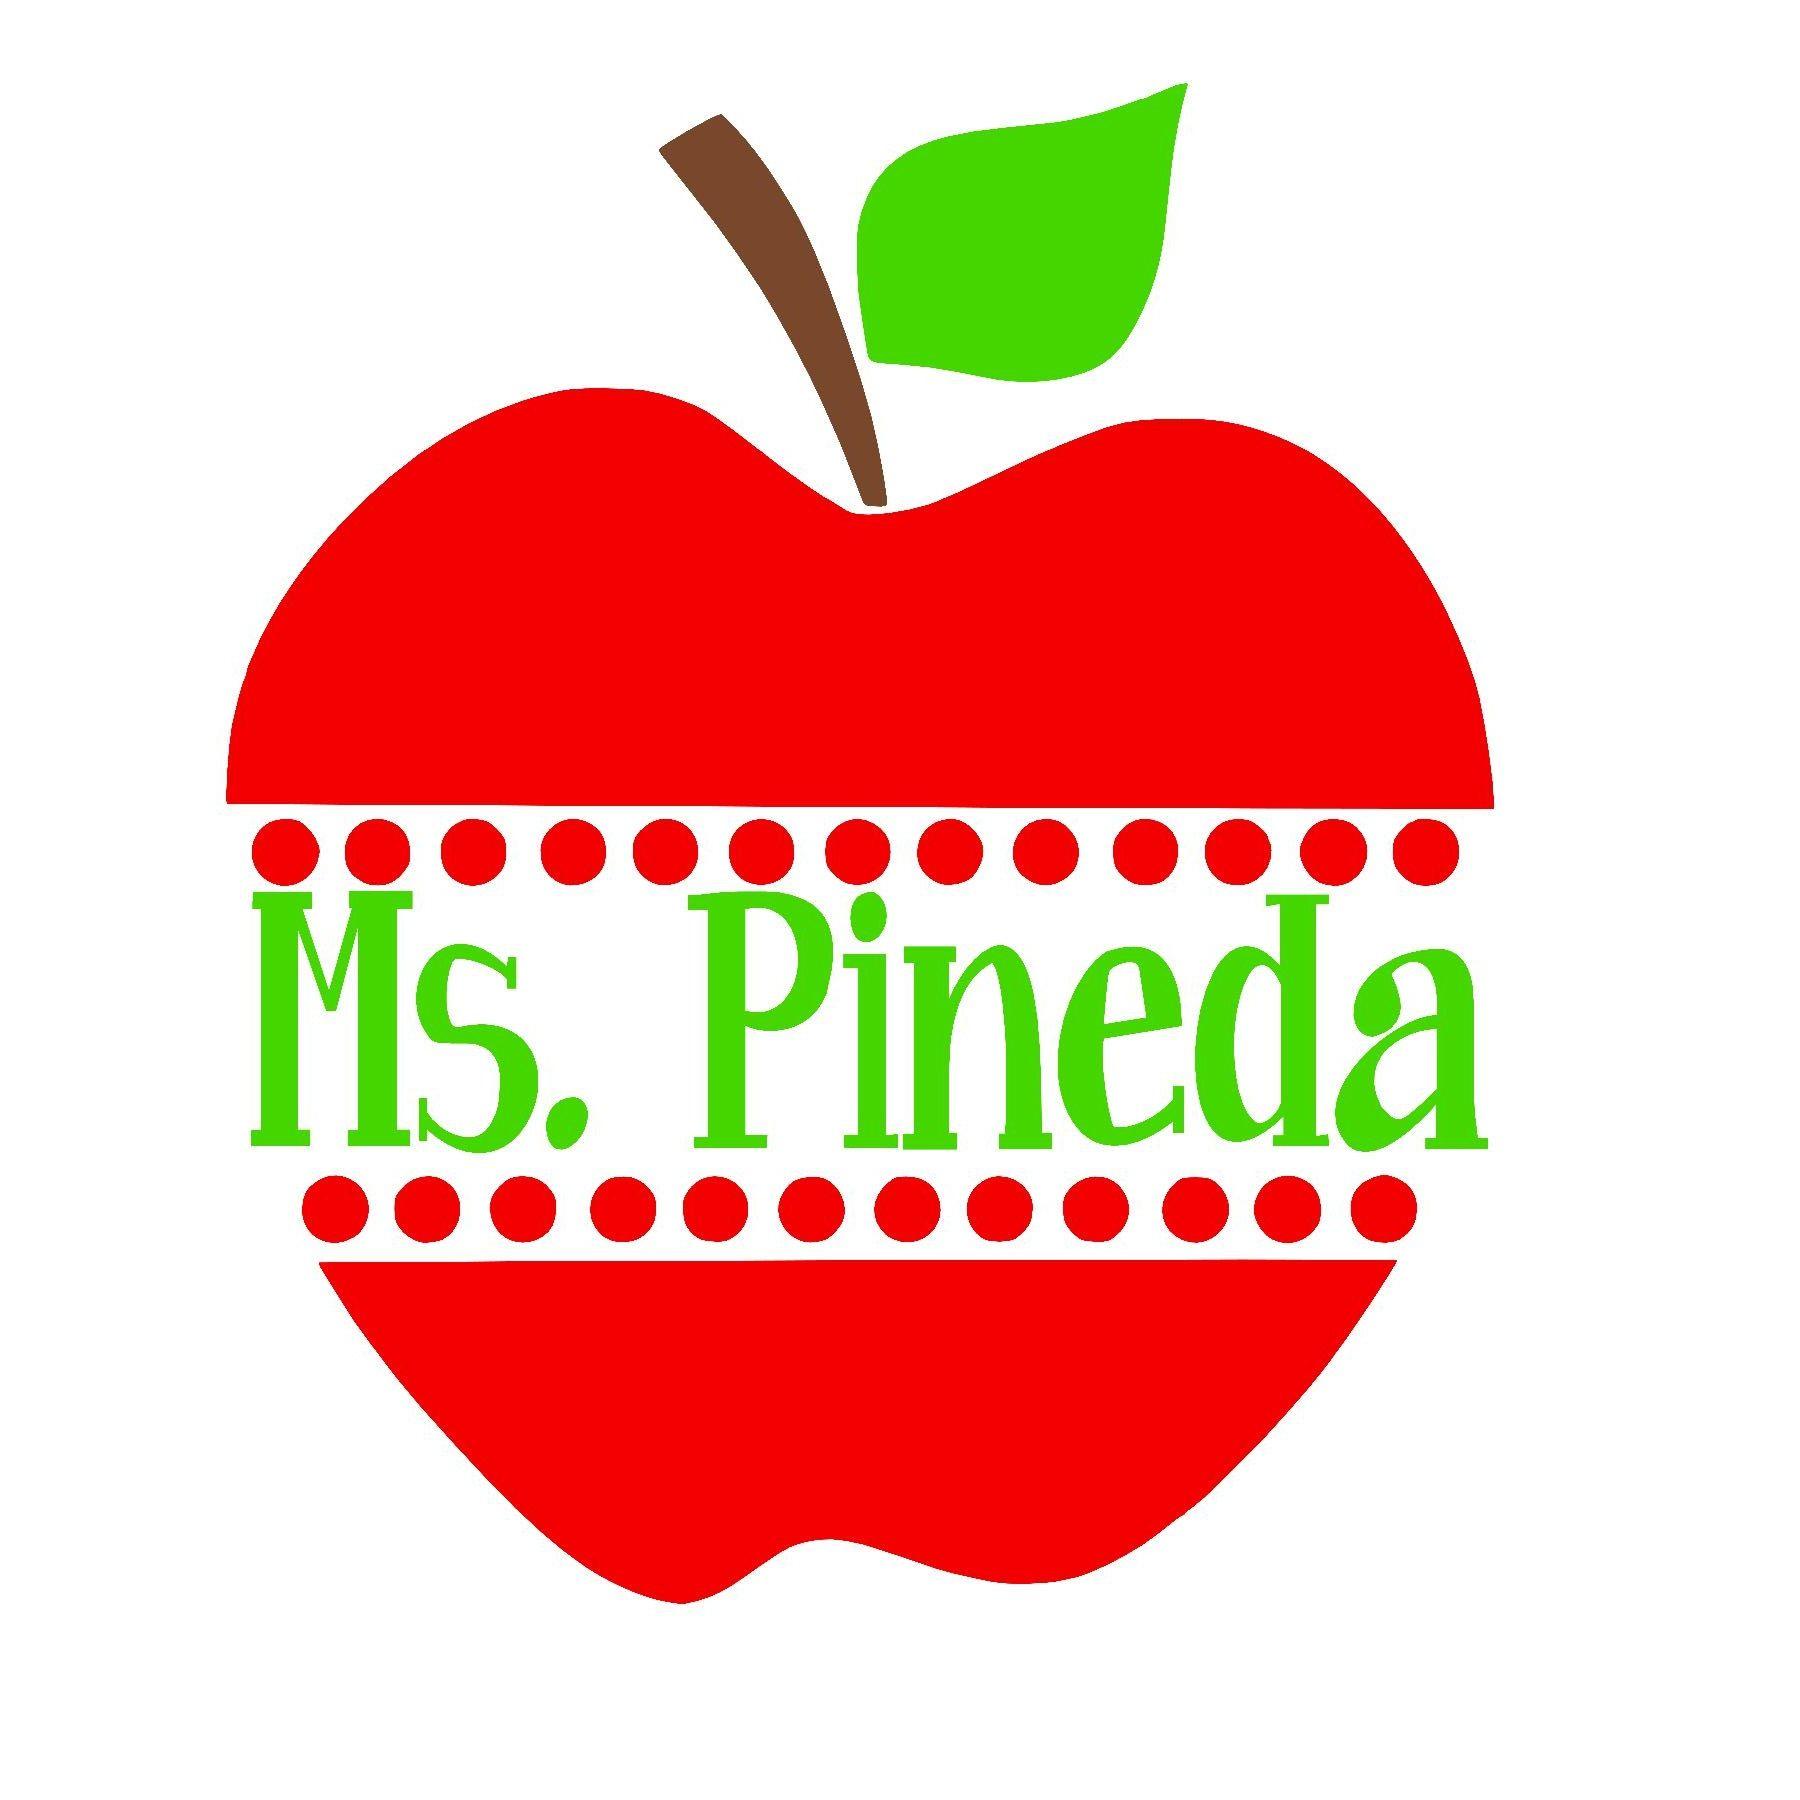 Customized Teacher Apple Decal by Buttercup Laine on Etsy